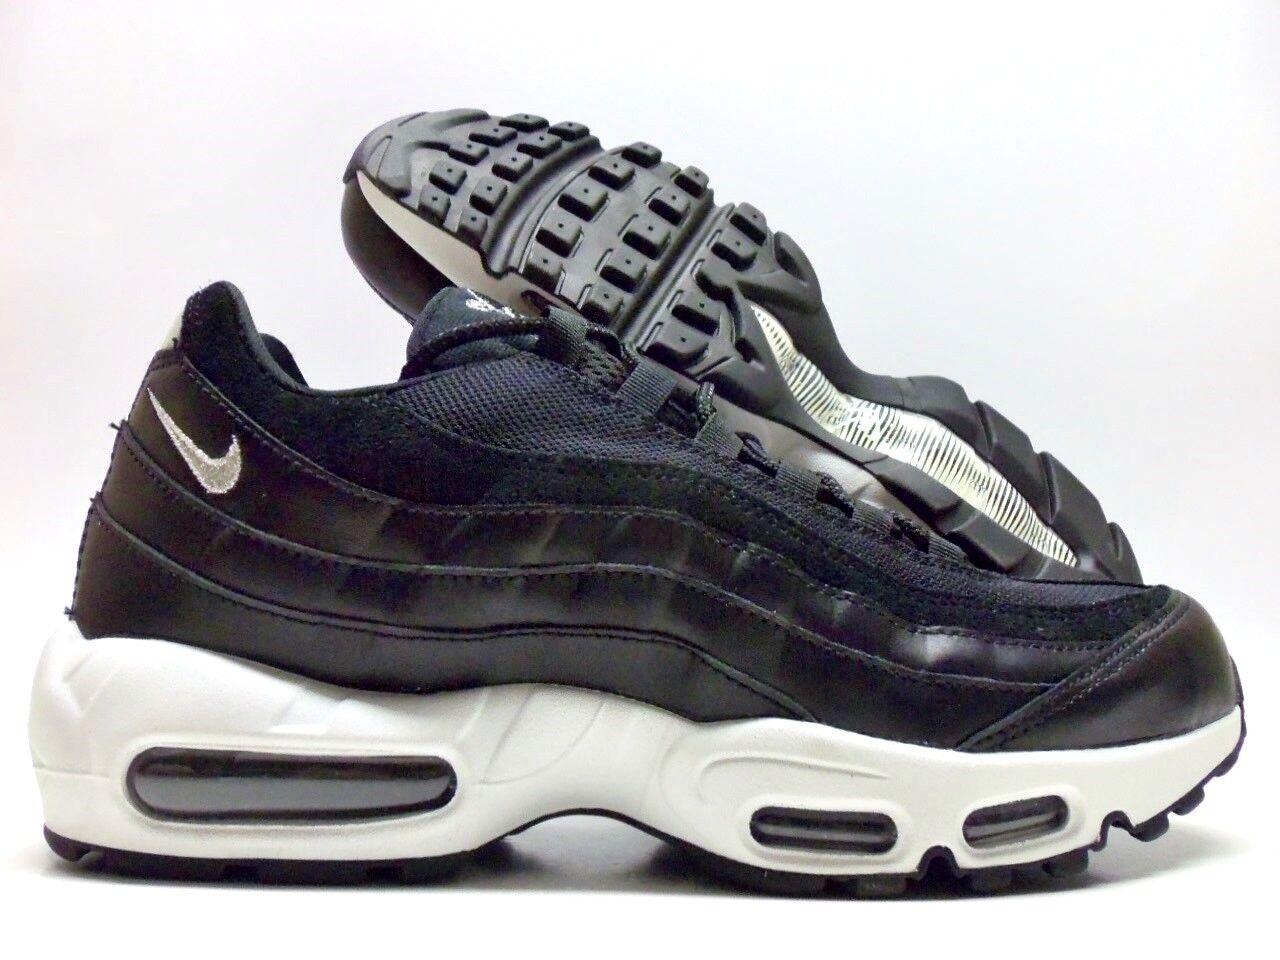 outlet store 7e284 ae949 Nike Air Max 95 PRM Rebel Skulls Black Chrome off White 538416-008 ...